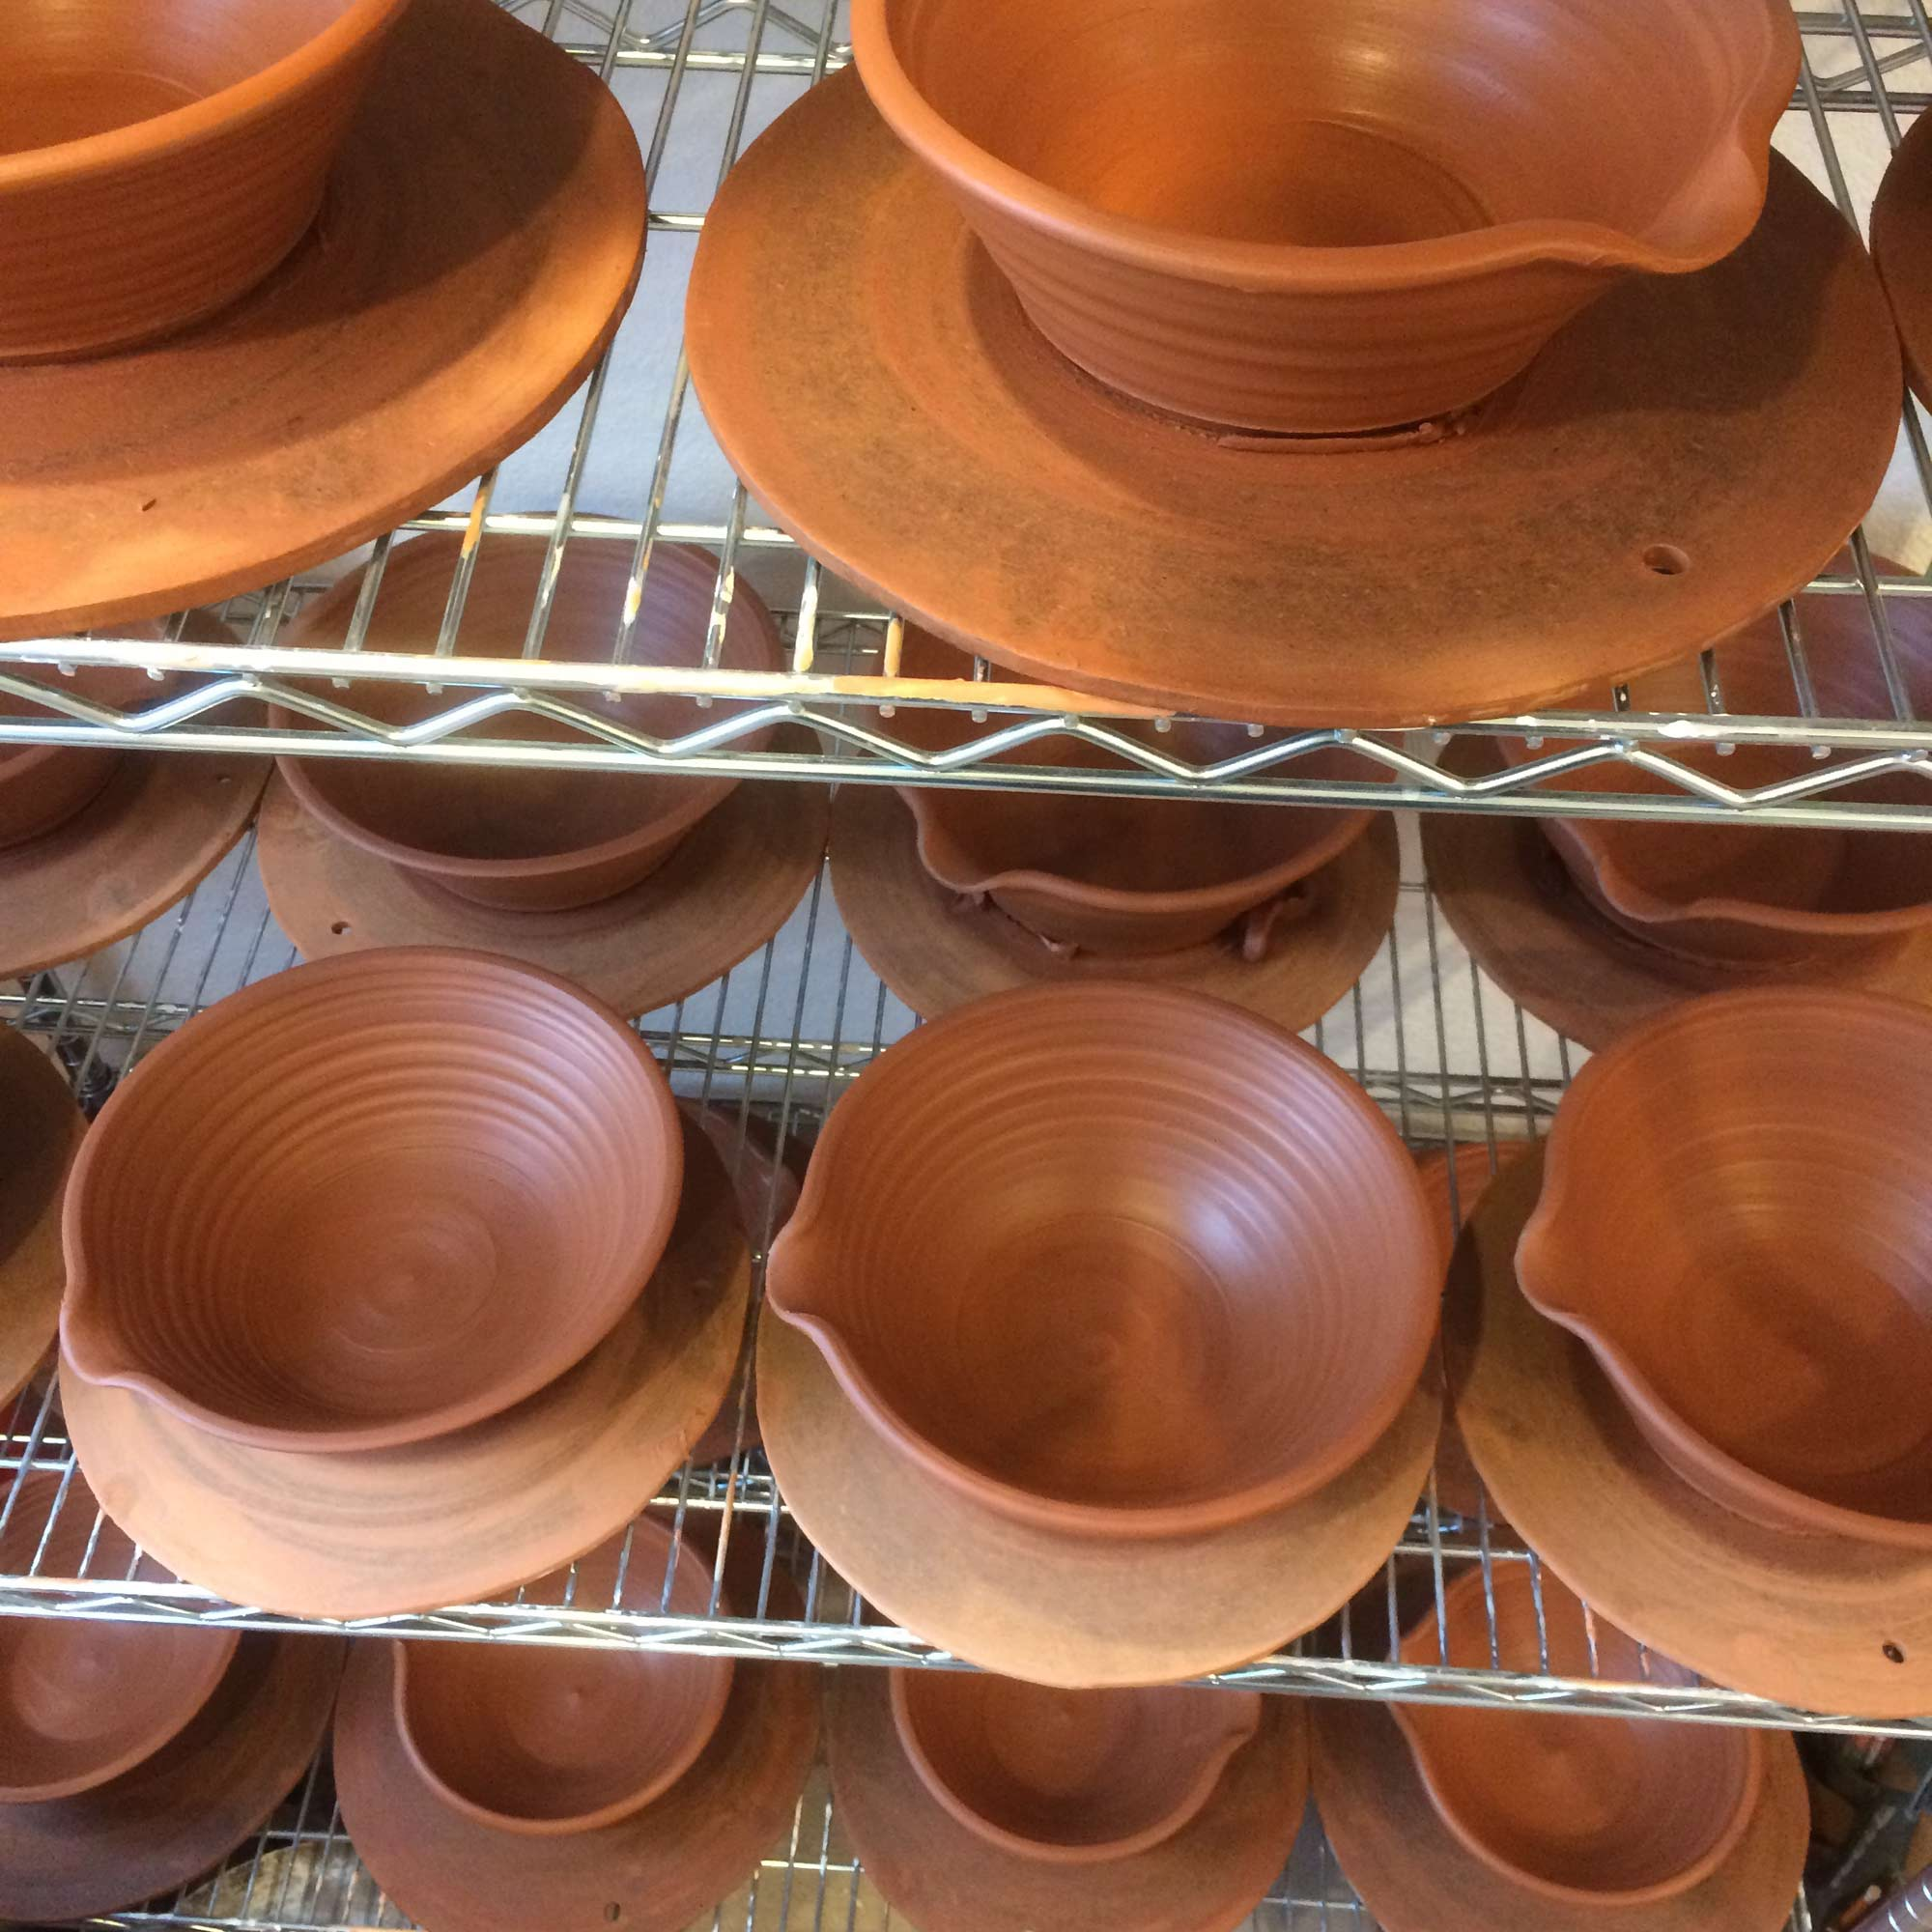 Freshly Thrown Cassoulet Bowls